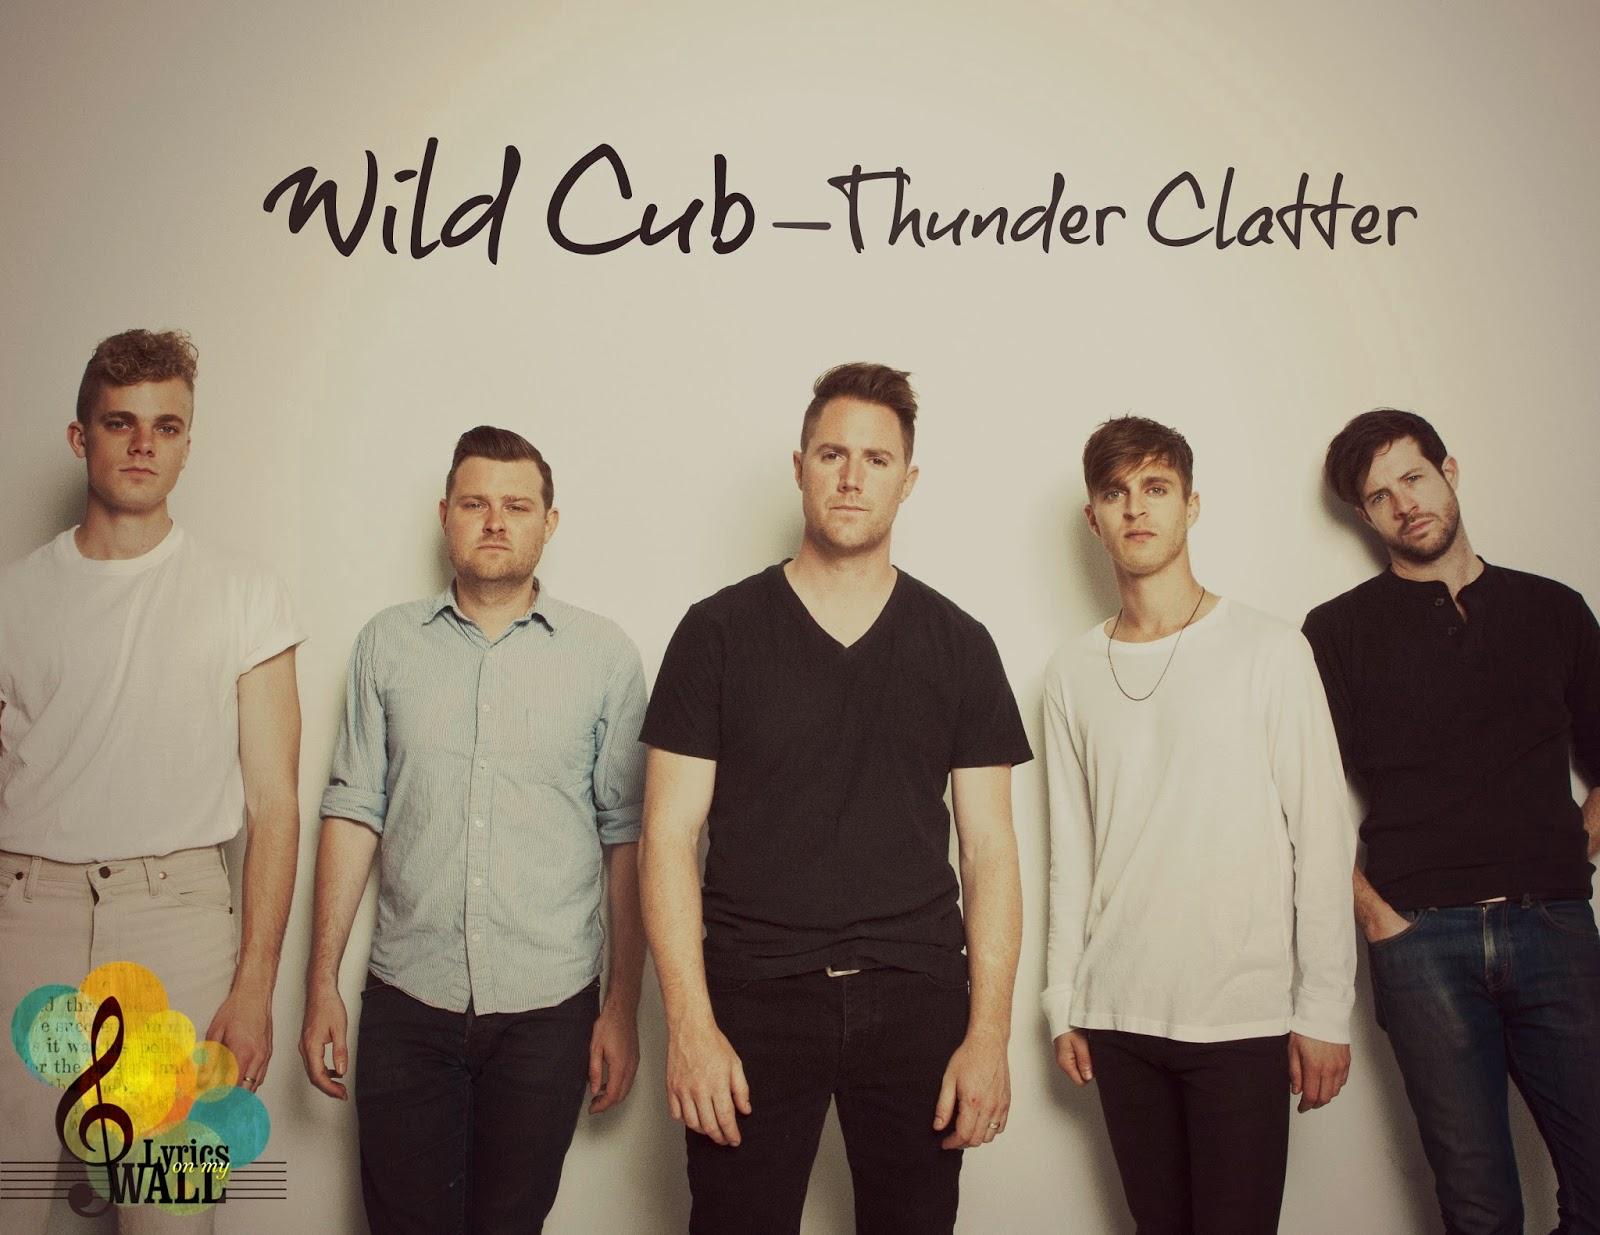 Lyrics on my wall...: Wild Cub-Thunder Clatter